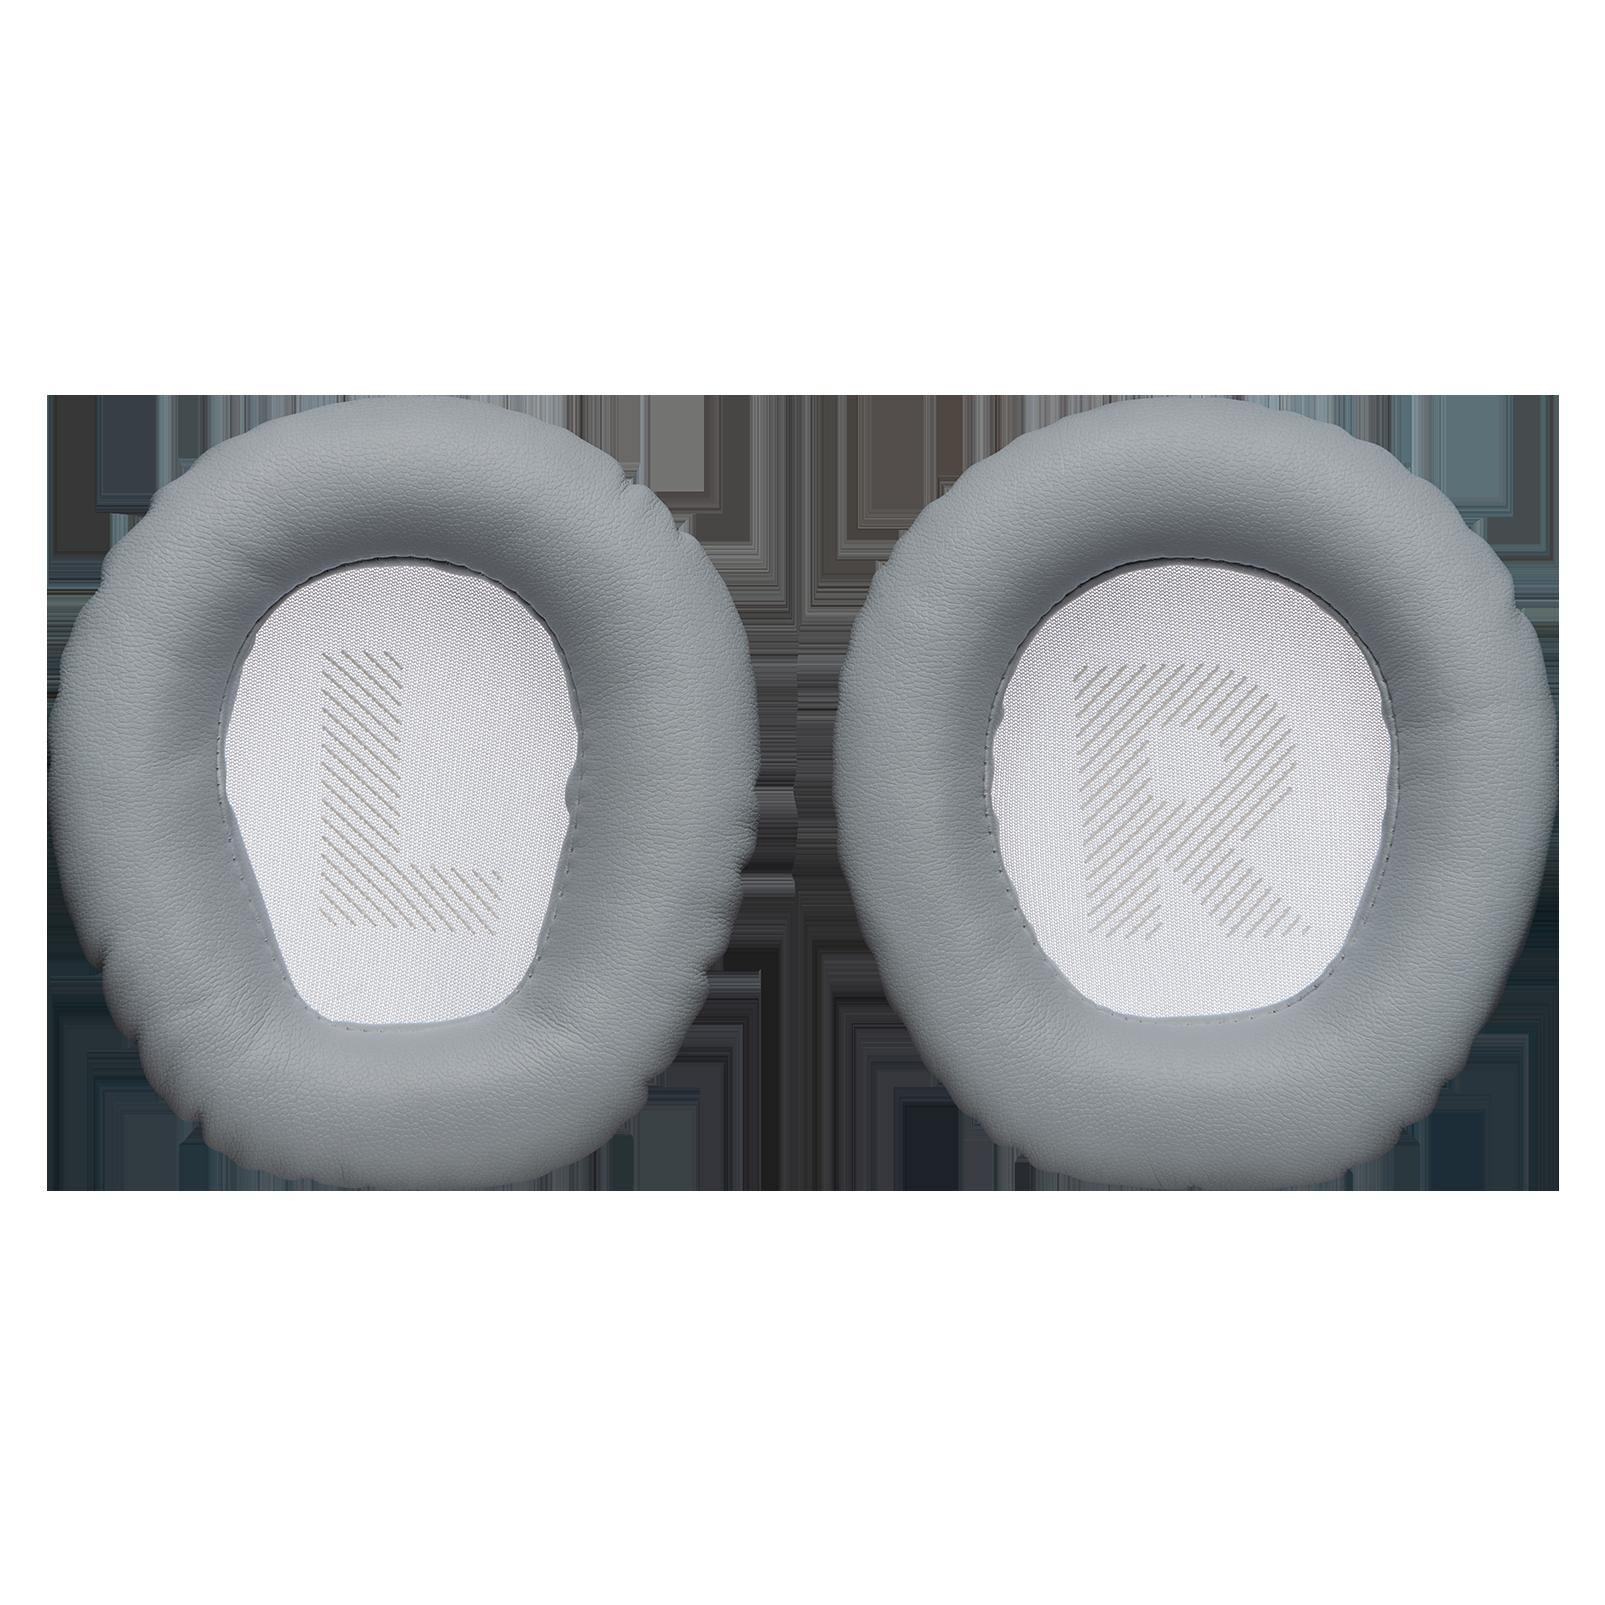 JBL Ear pads for Quantum 100 - White - Ear Pads (L+R) - Hero